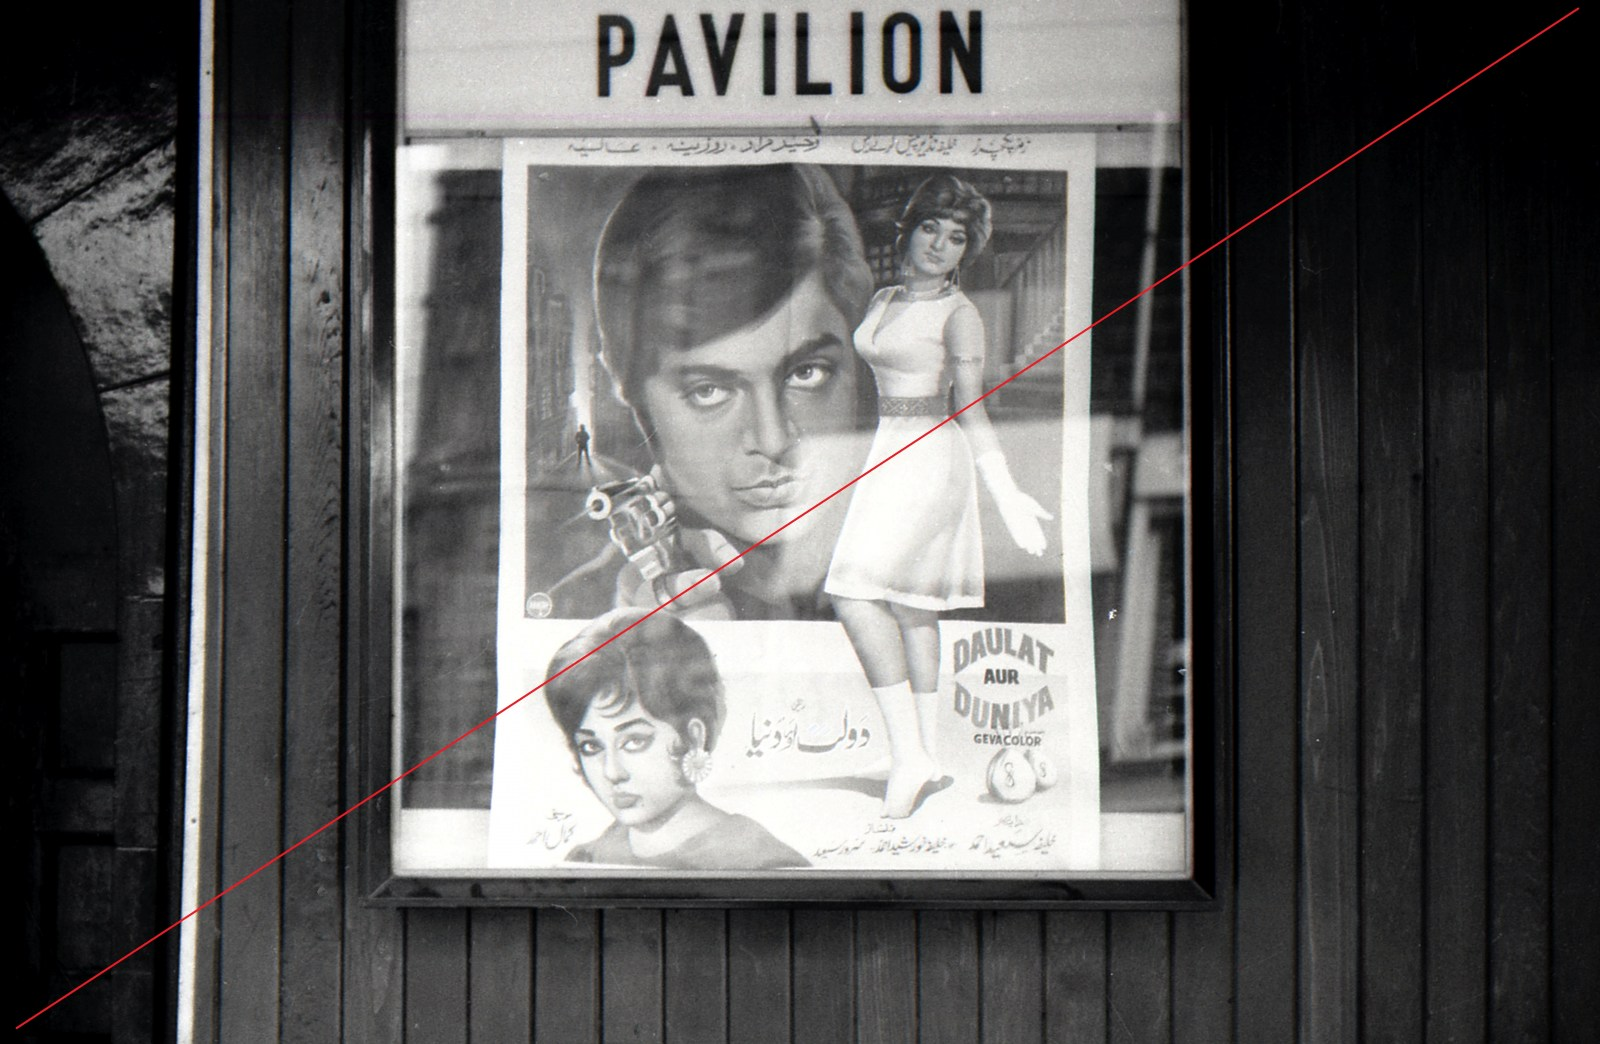 SLS074-Attercliffe Pavilion Cinema, Attercliffe Common-16-09-1972-Web Copy.jpg